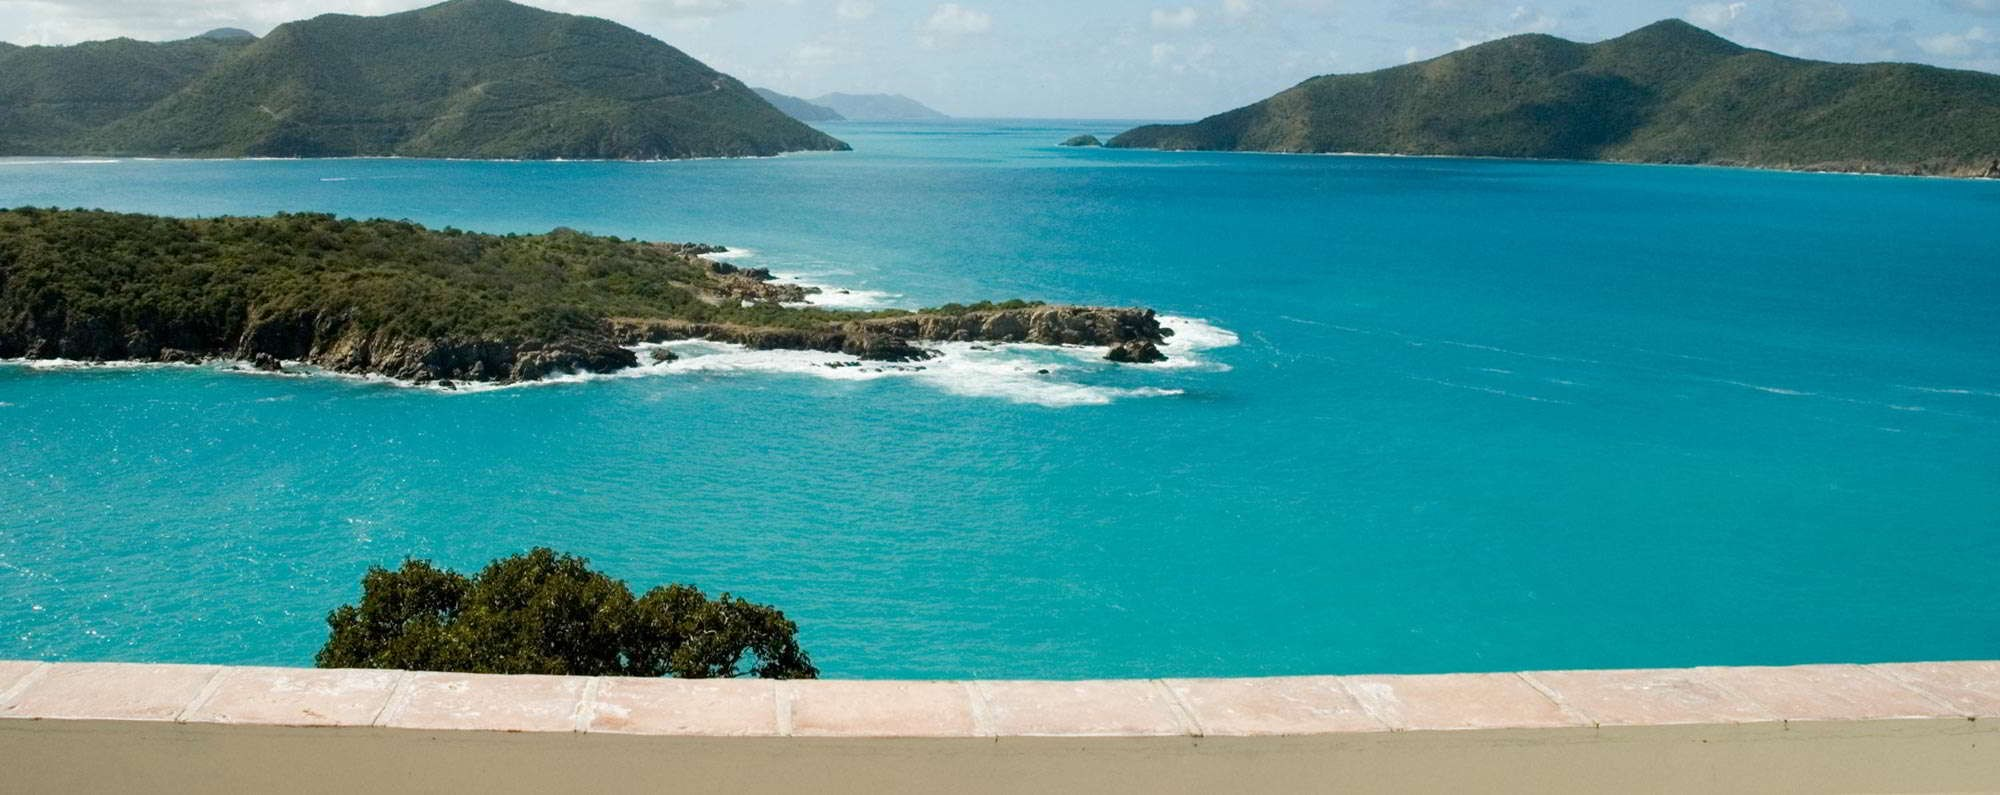 Yacht charter in British Virgin Islands